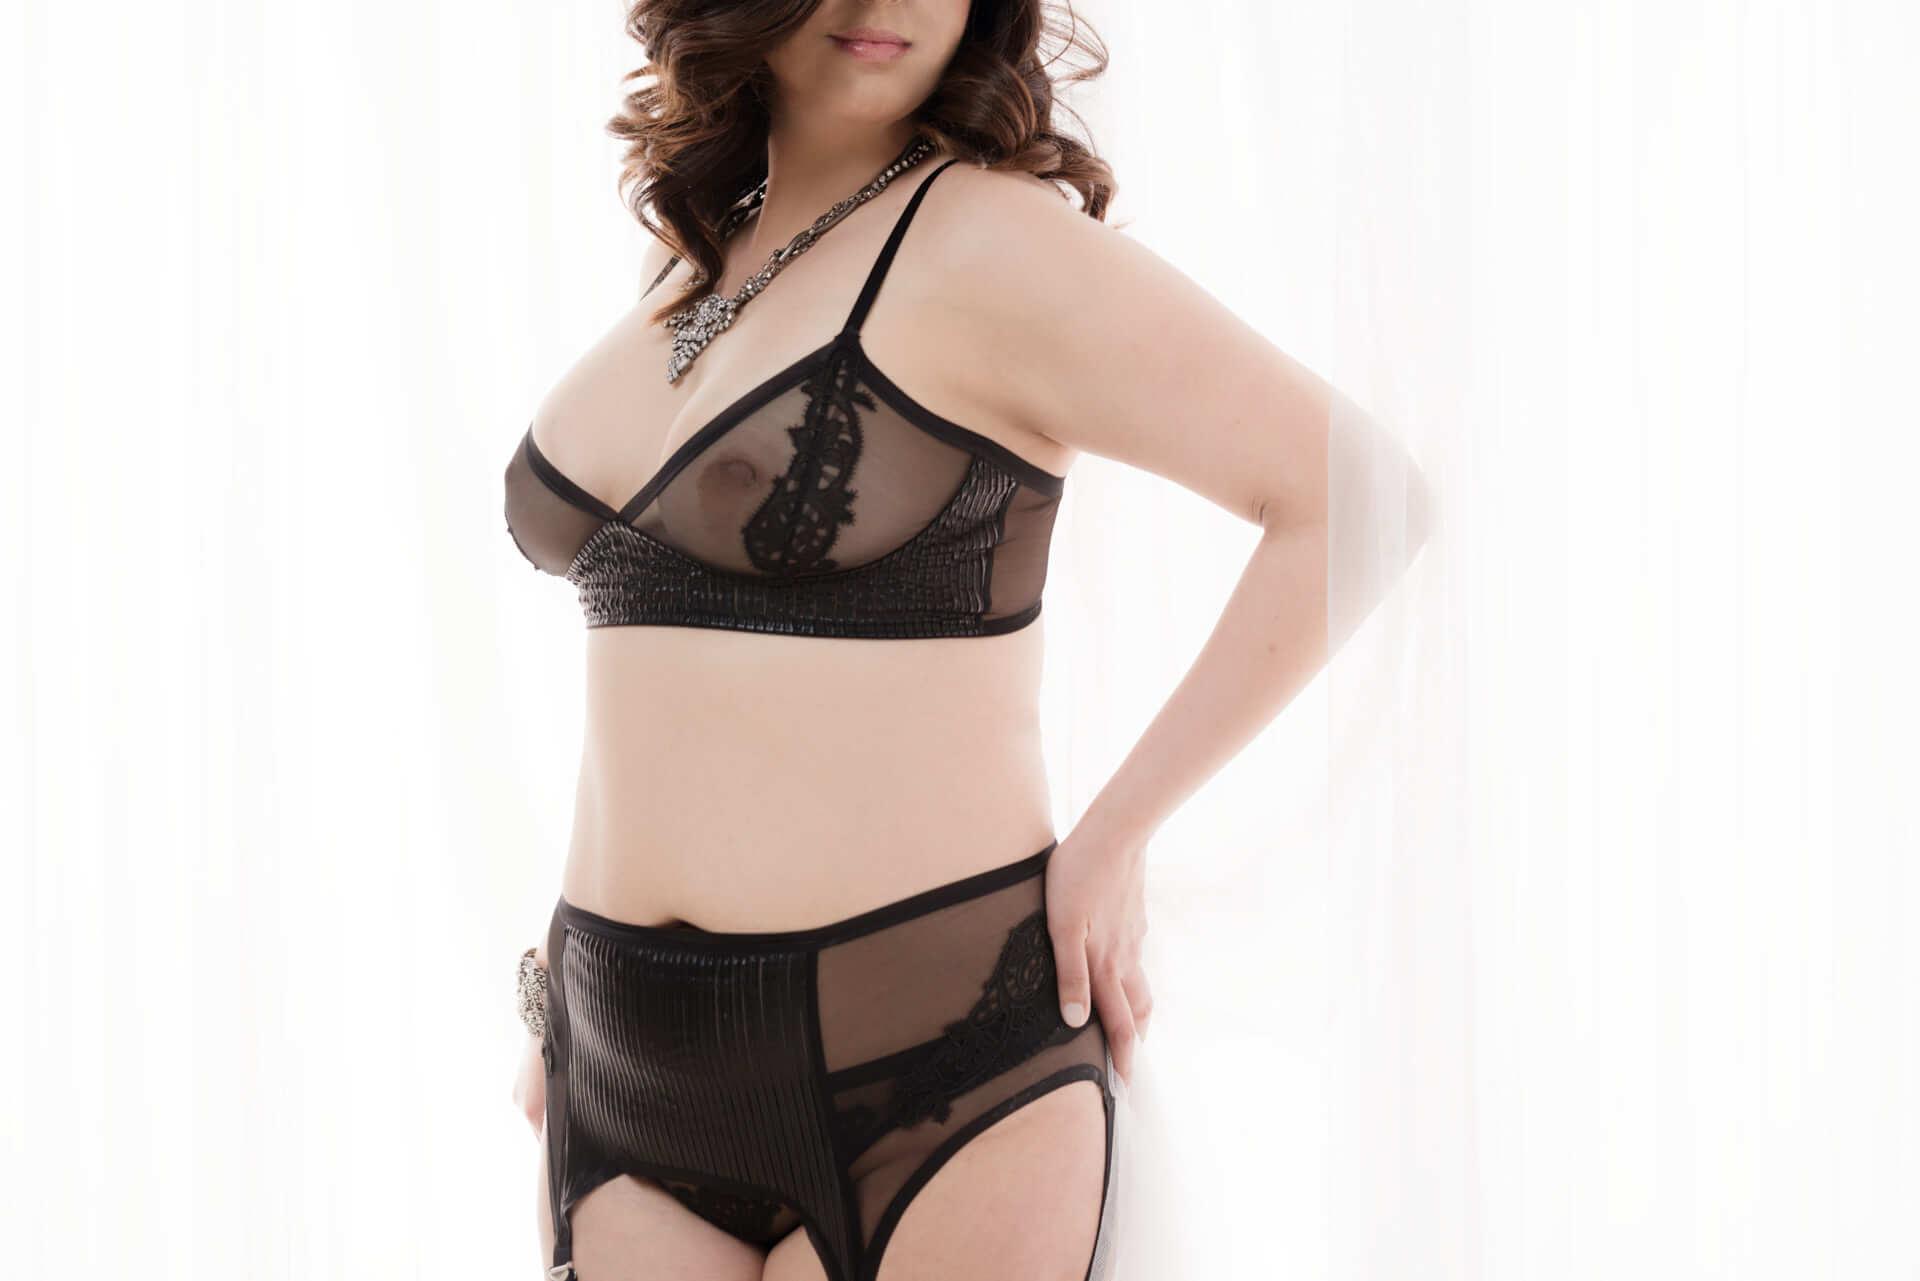 Toronto boudoir photography professional studio kink sex positive body positive LGBTQ boudoir studio